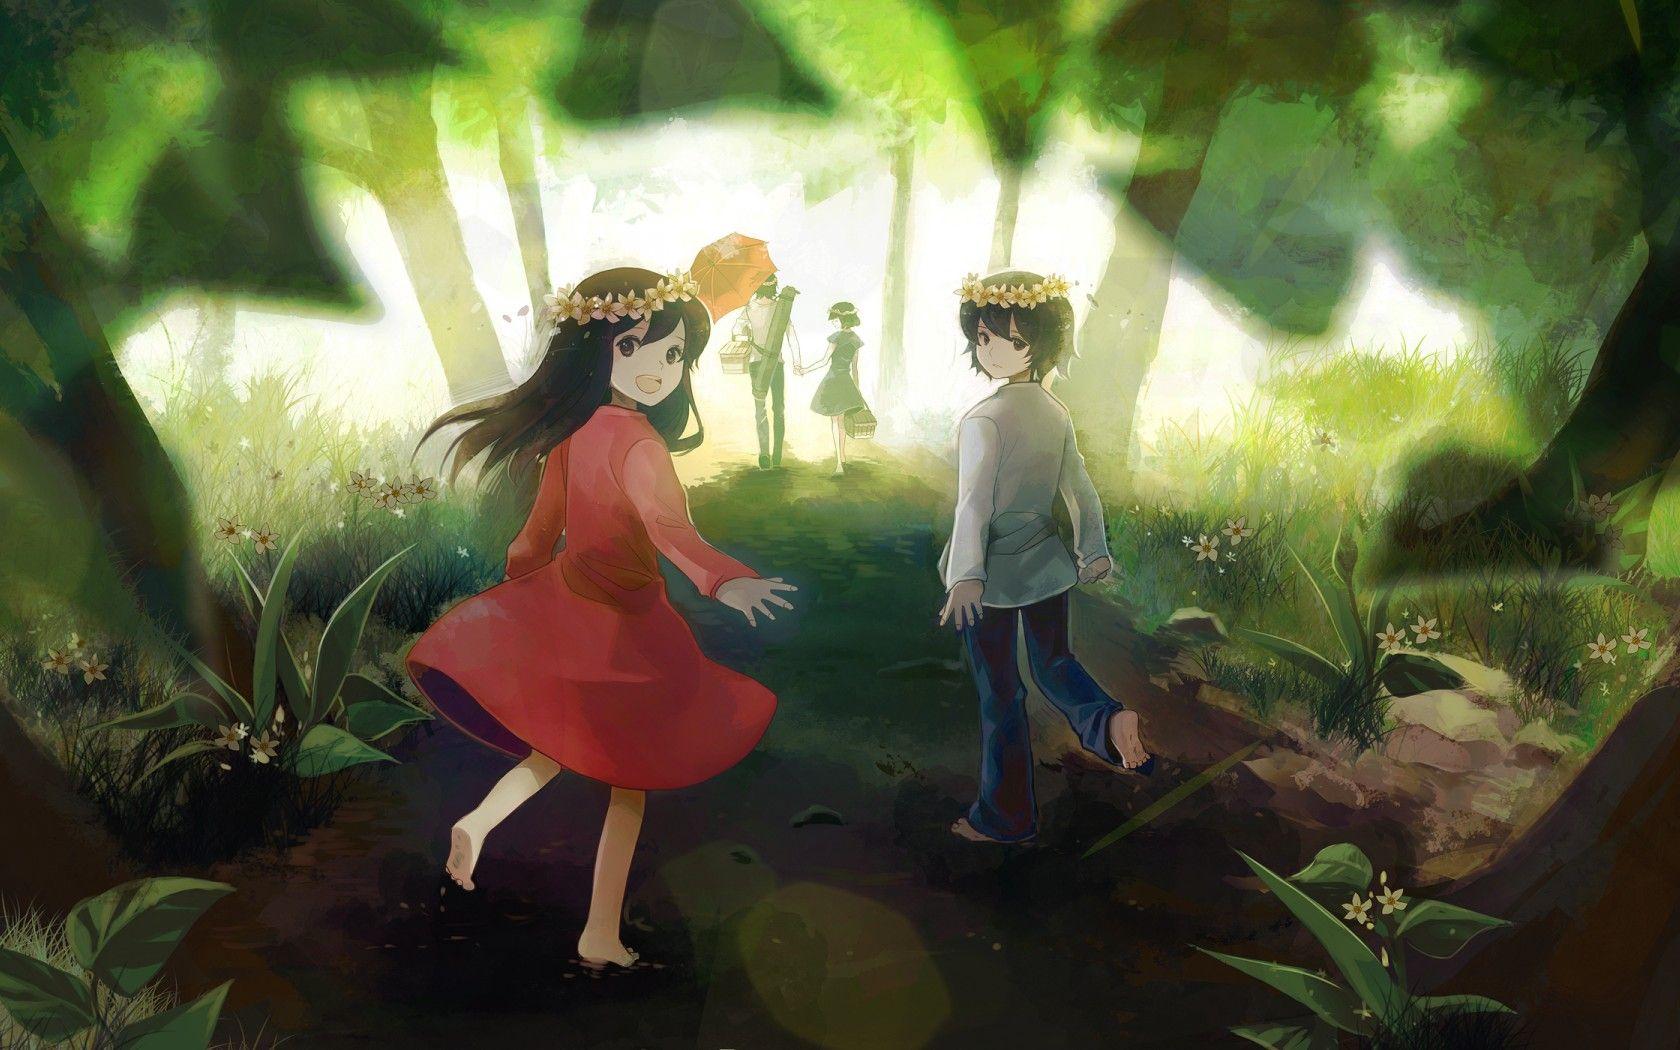 wolf children wallpaper Google Search Anime and Manga